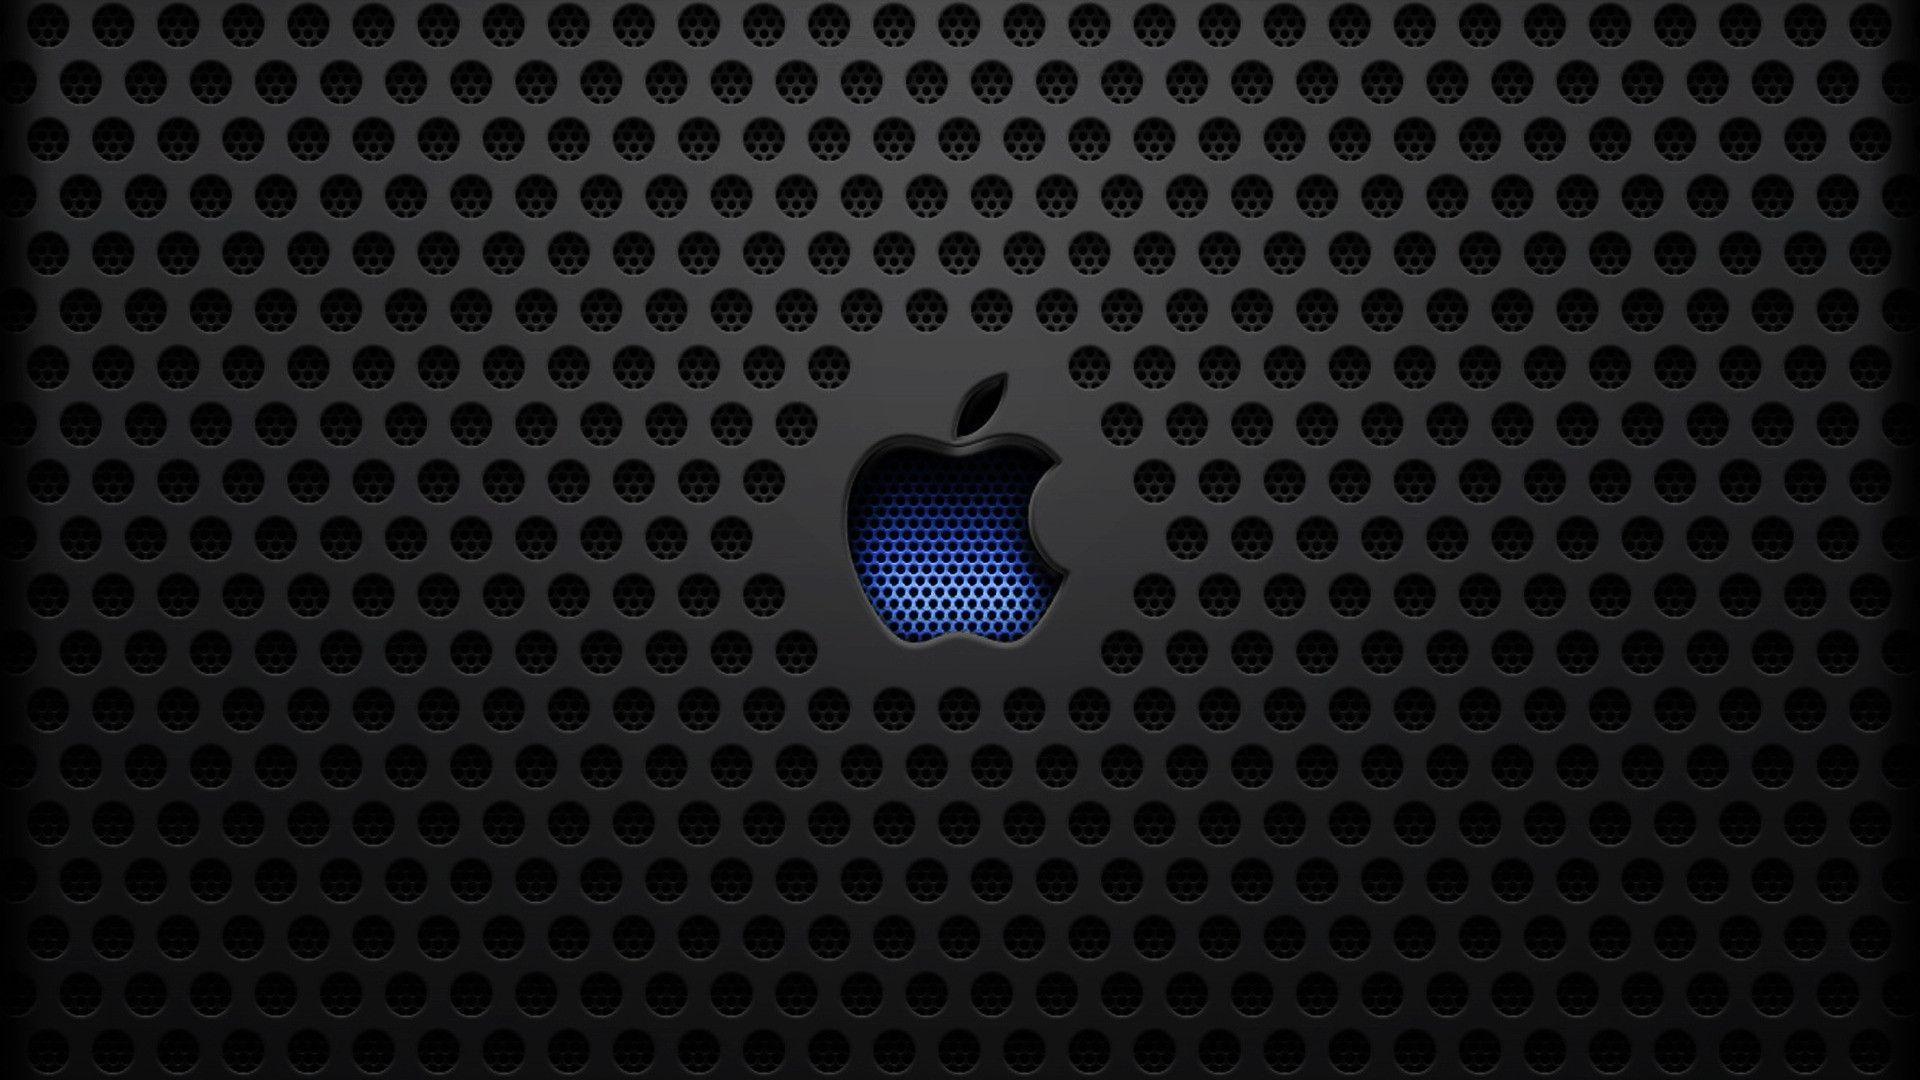 Hd wallpaper macbook - Dark Wallpapers To Compliment Your New Iphone 1920 1080 Black Wallpapers Apple 38 Wallpapers